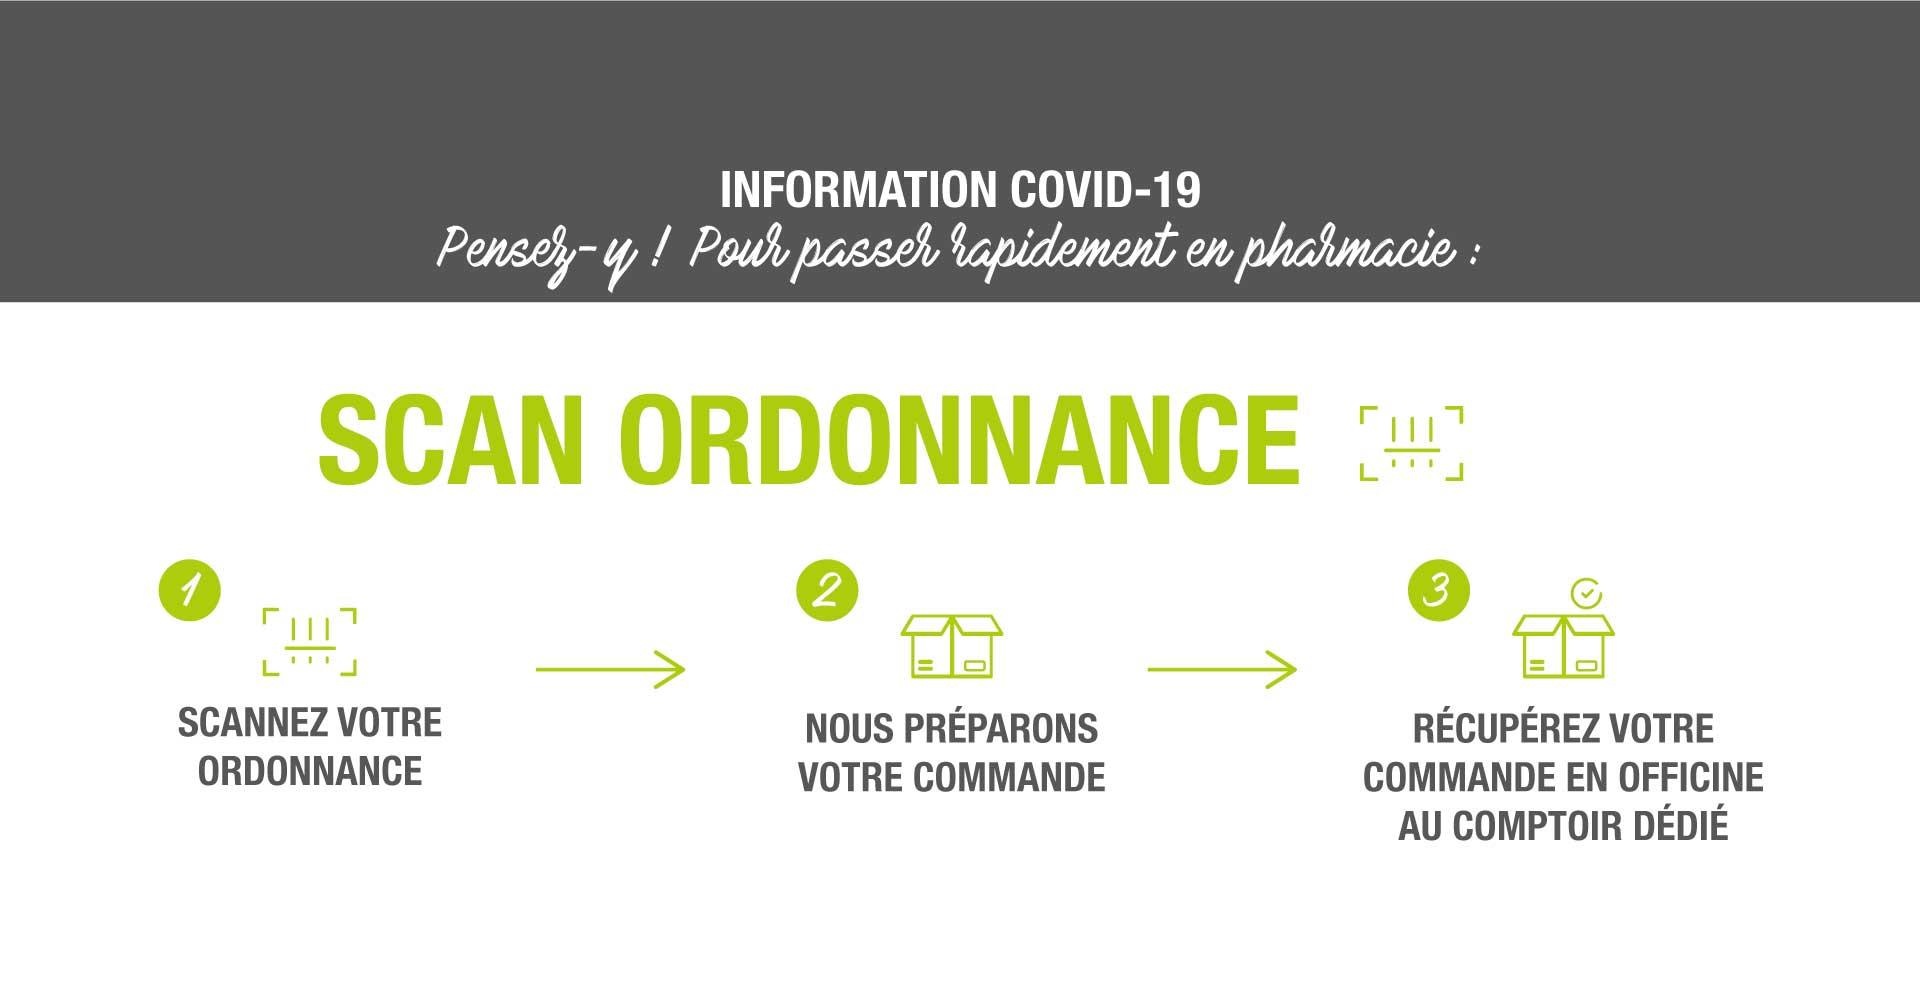 information covid19 : scan ordonnance